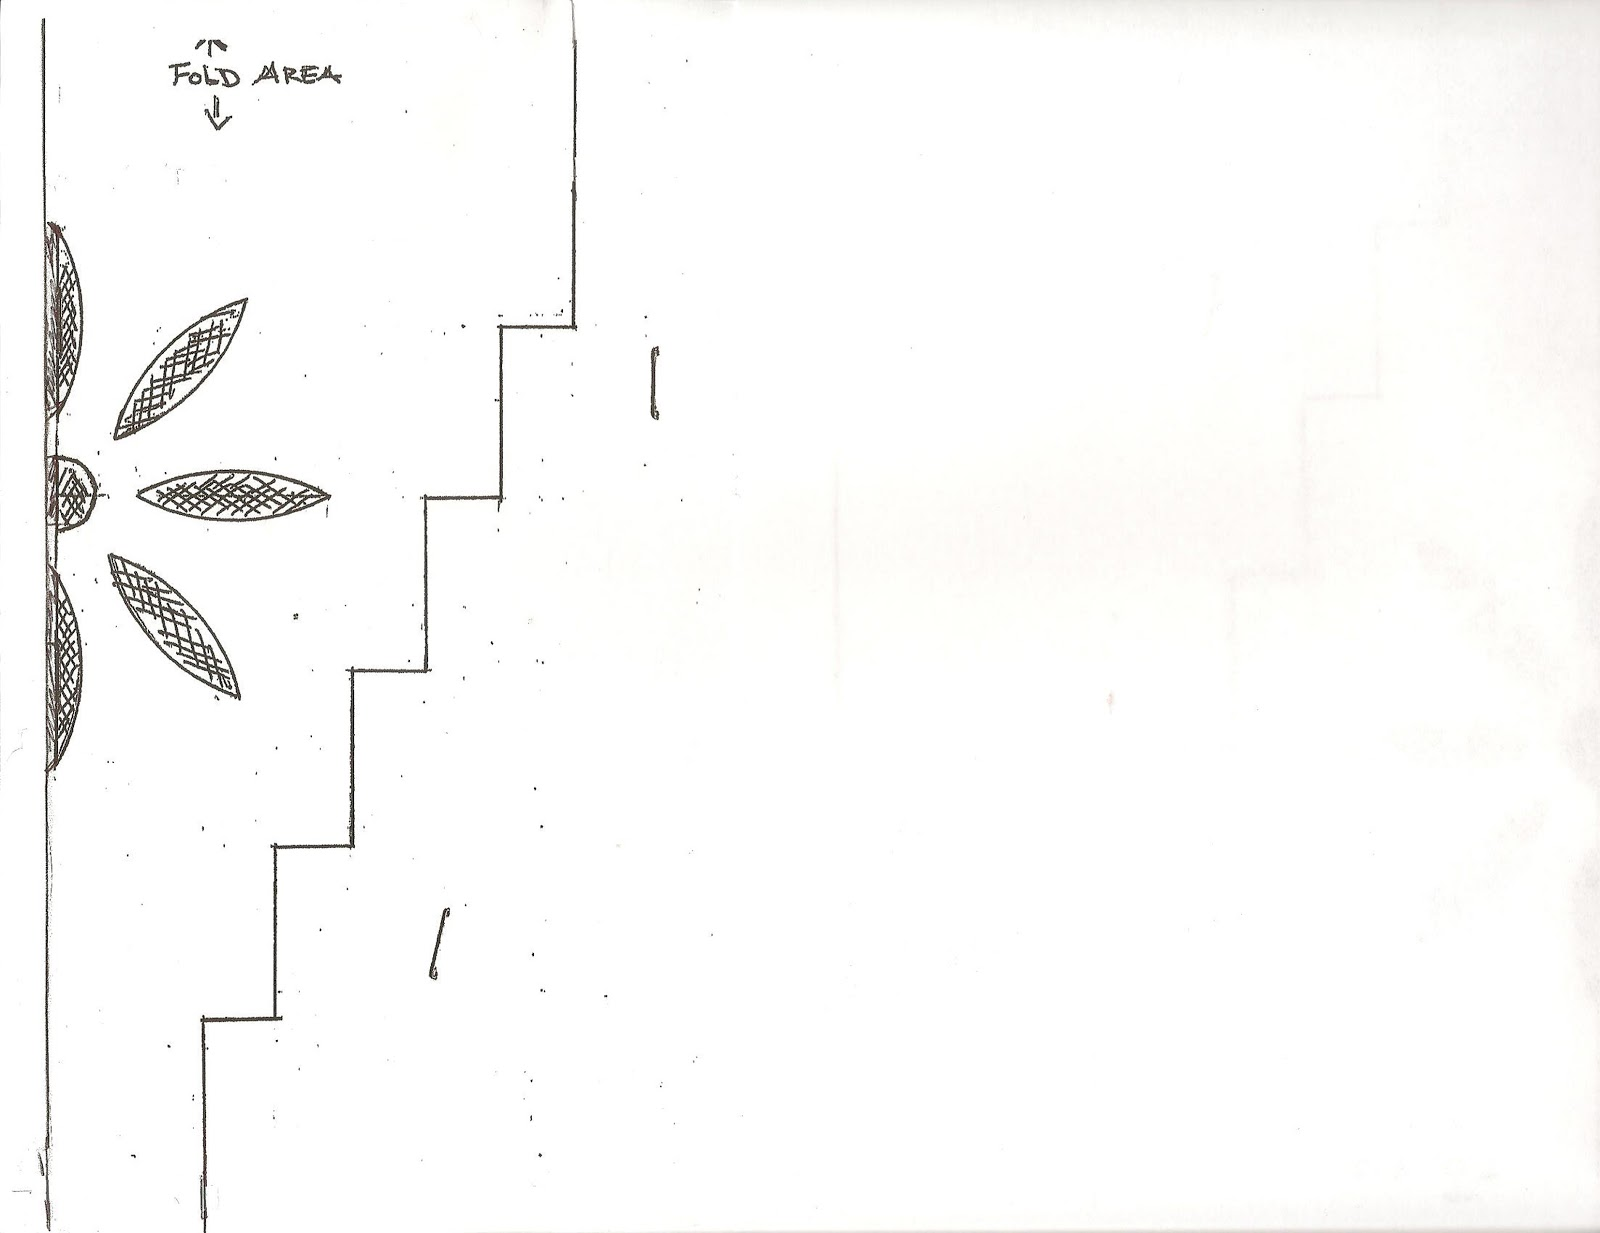 papel picado designs template - photo #5